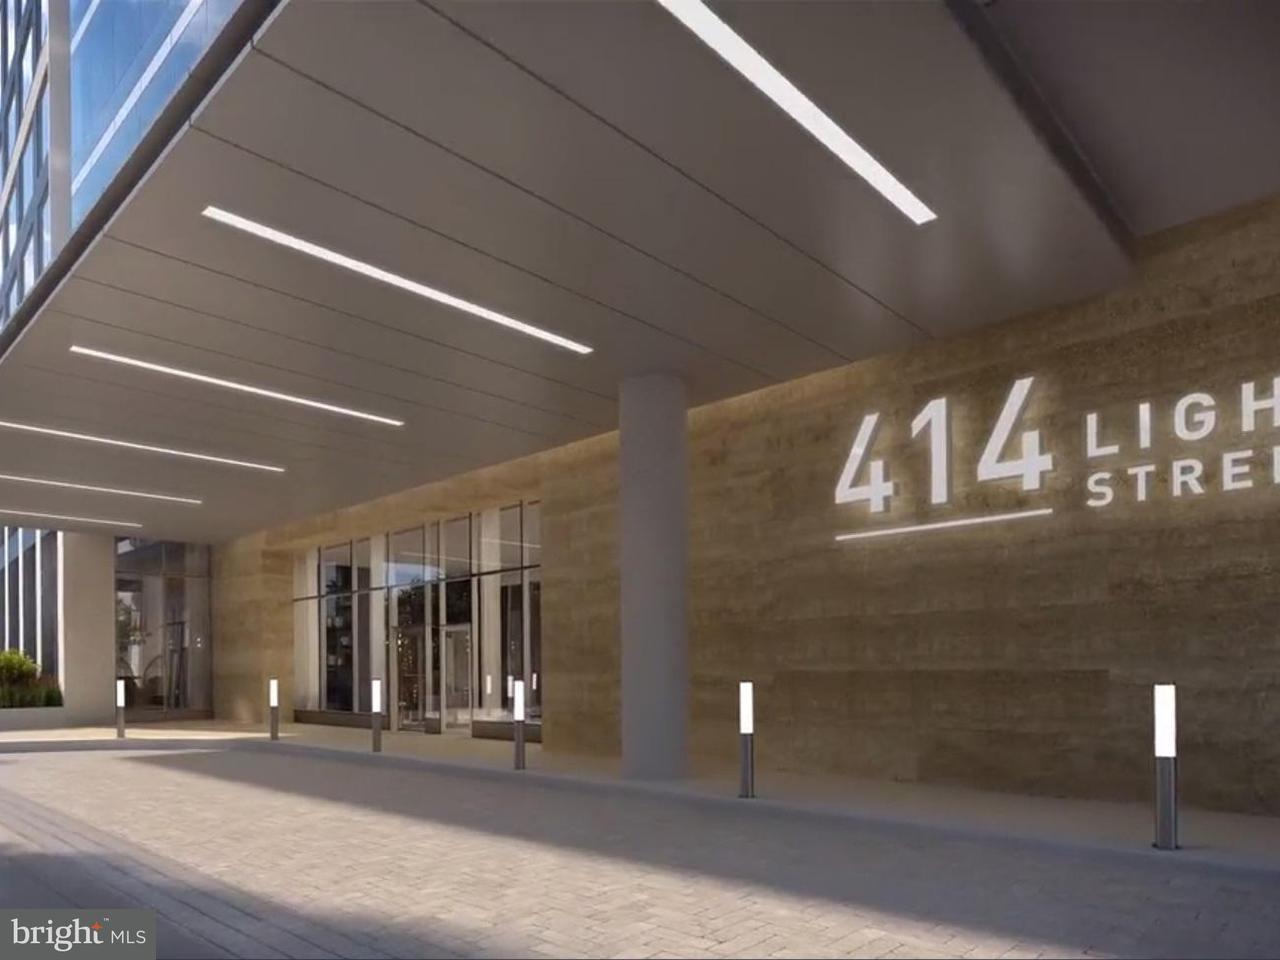 Condominium for Rent at 414 Light St #309 Baltimore, Maryland 21202 United States